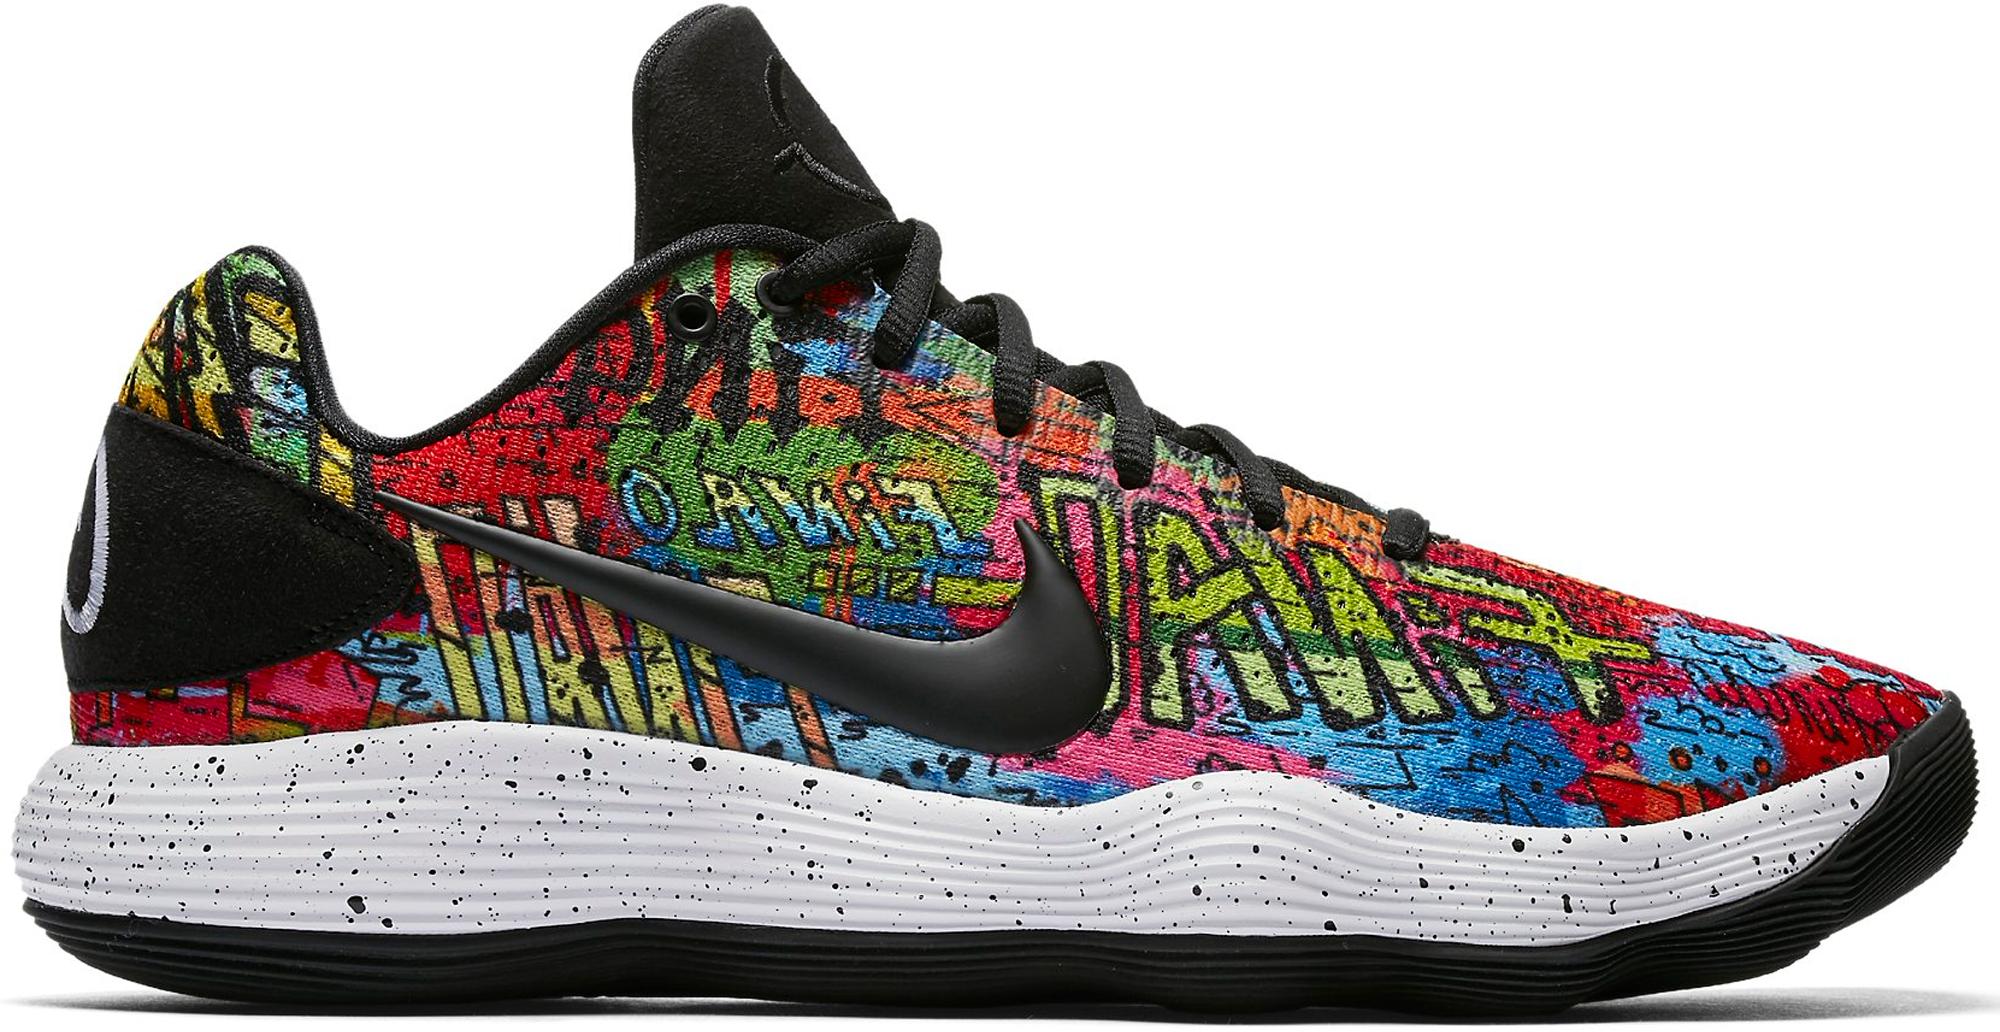 New Arrival 2015 Nike Hyperdunk 2014 City Pack Chicago